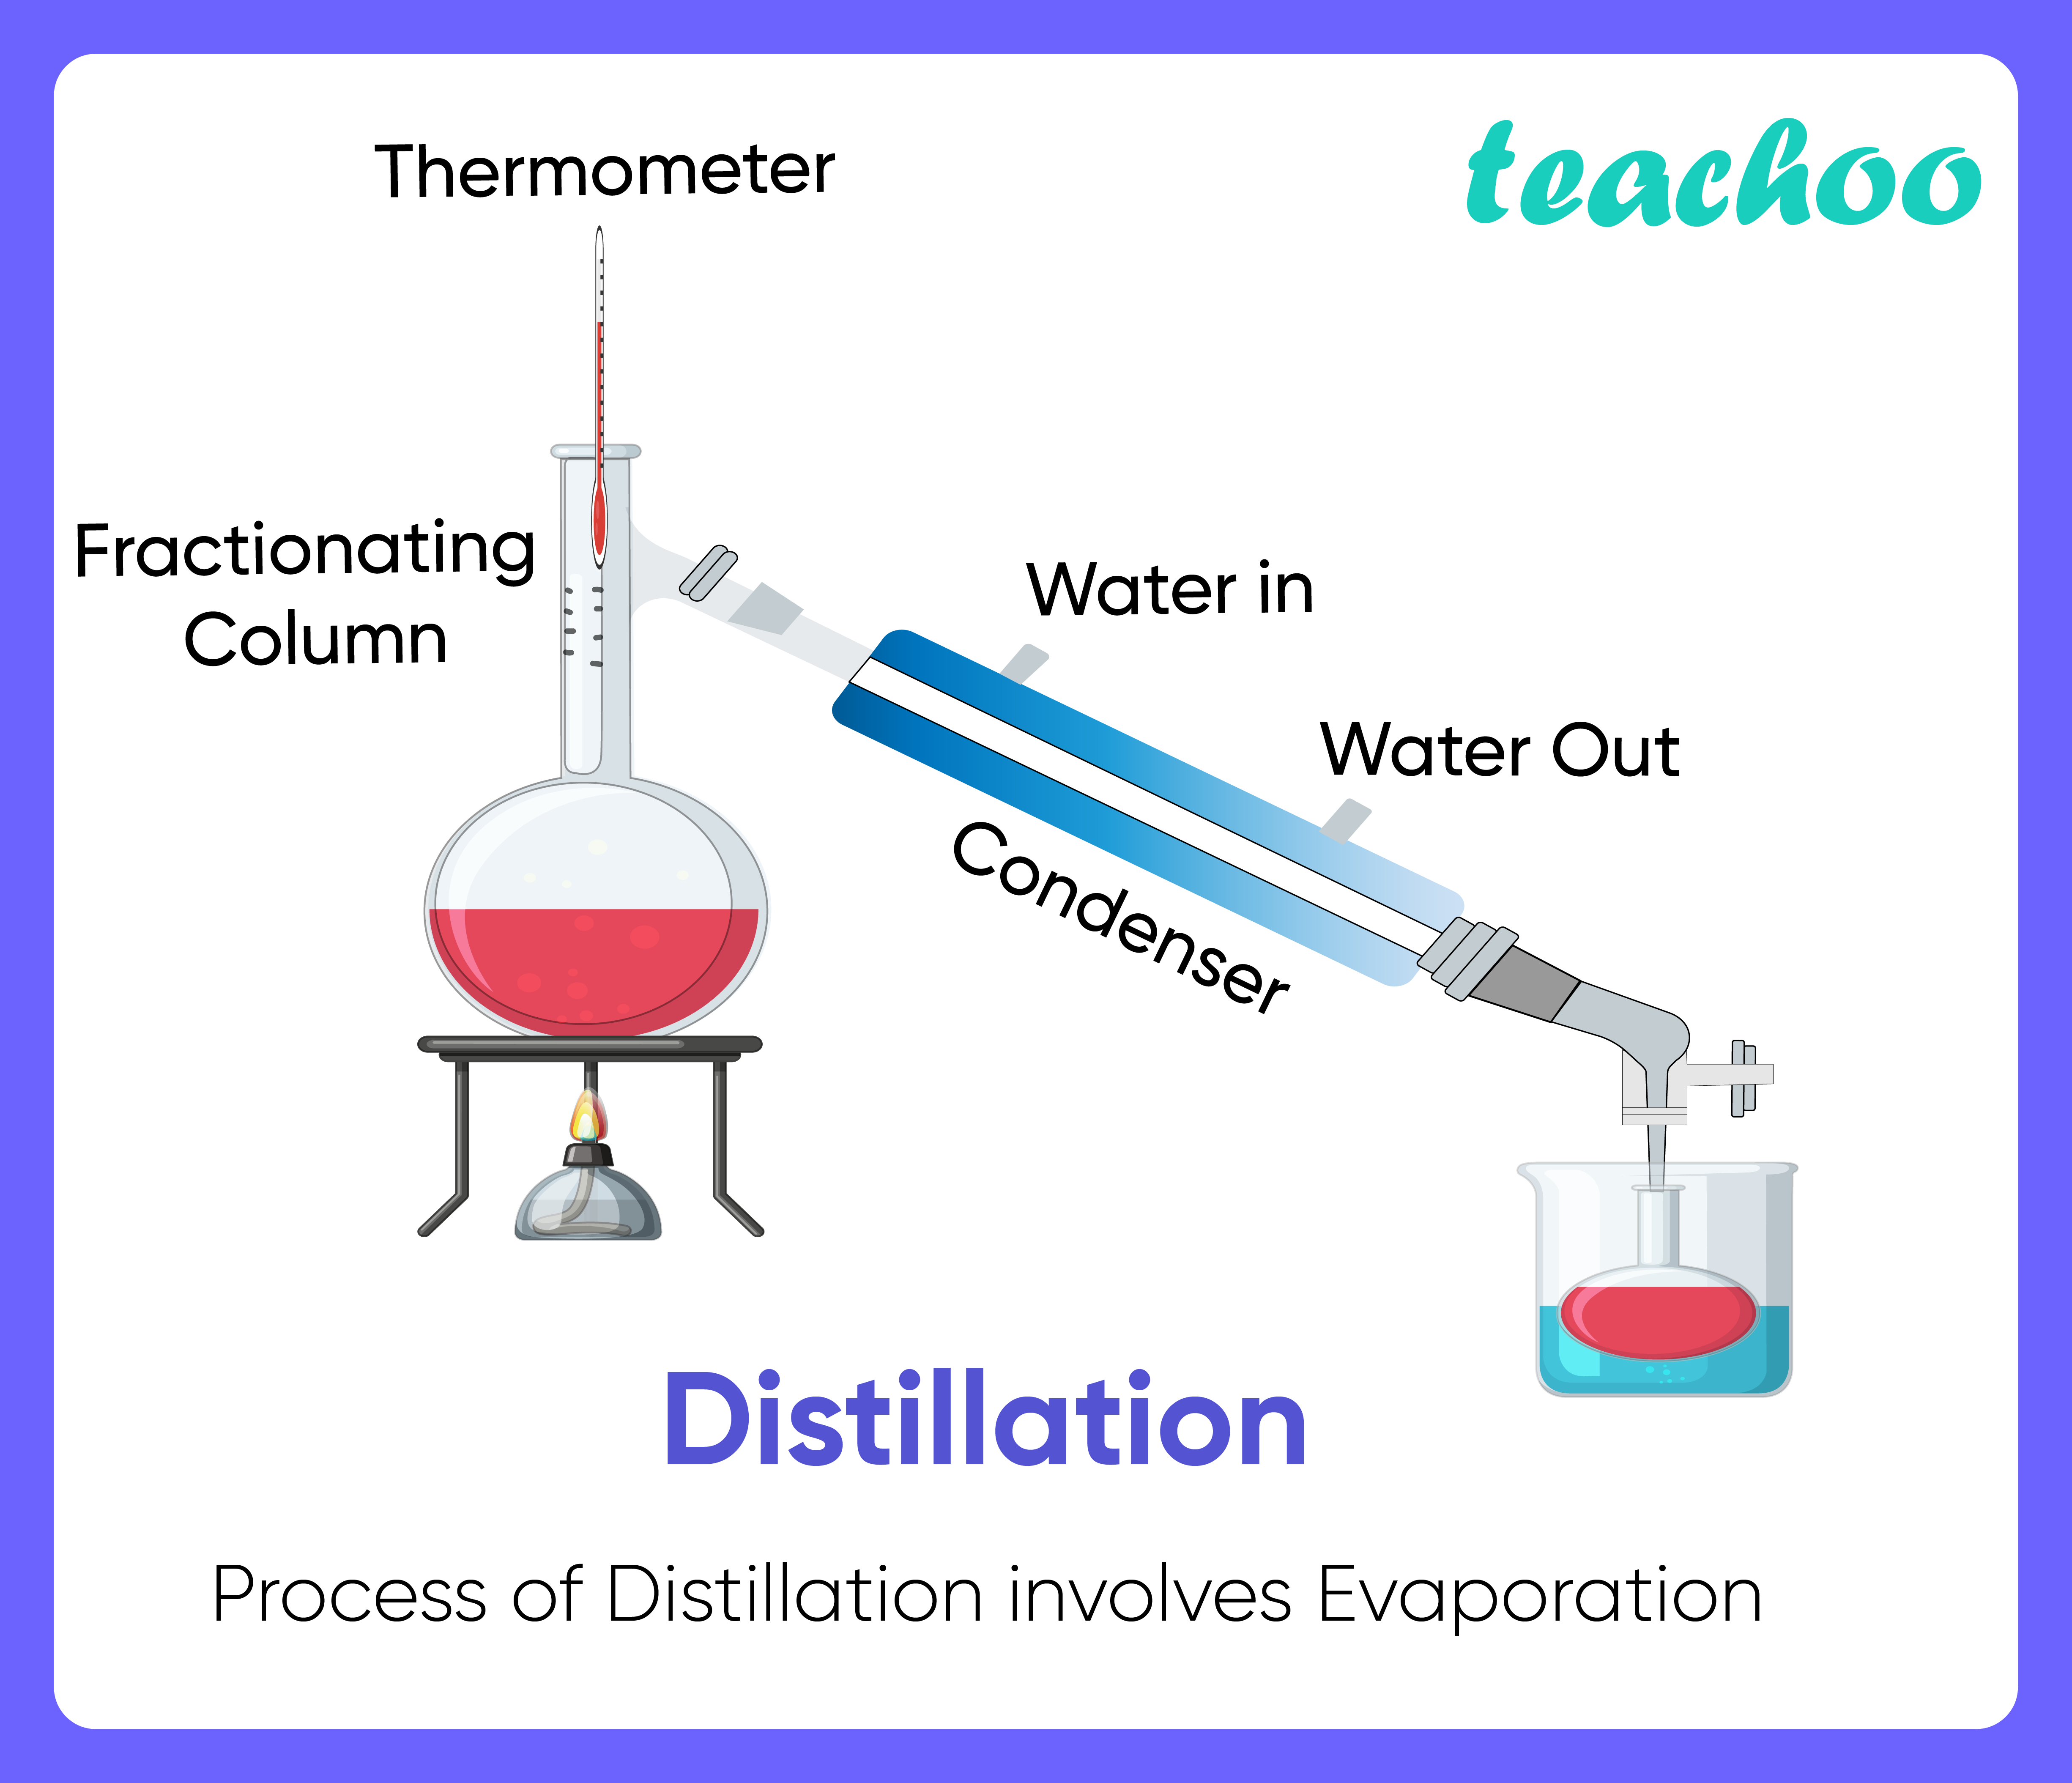 Distillation-Teachoo-01.png